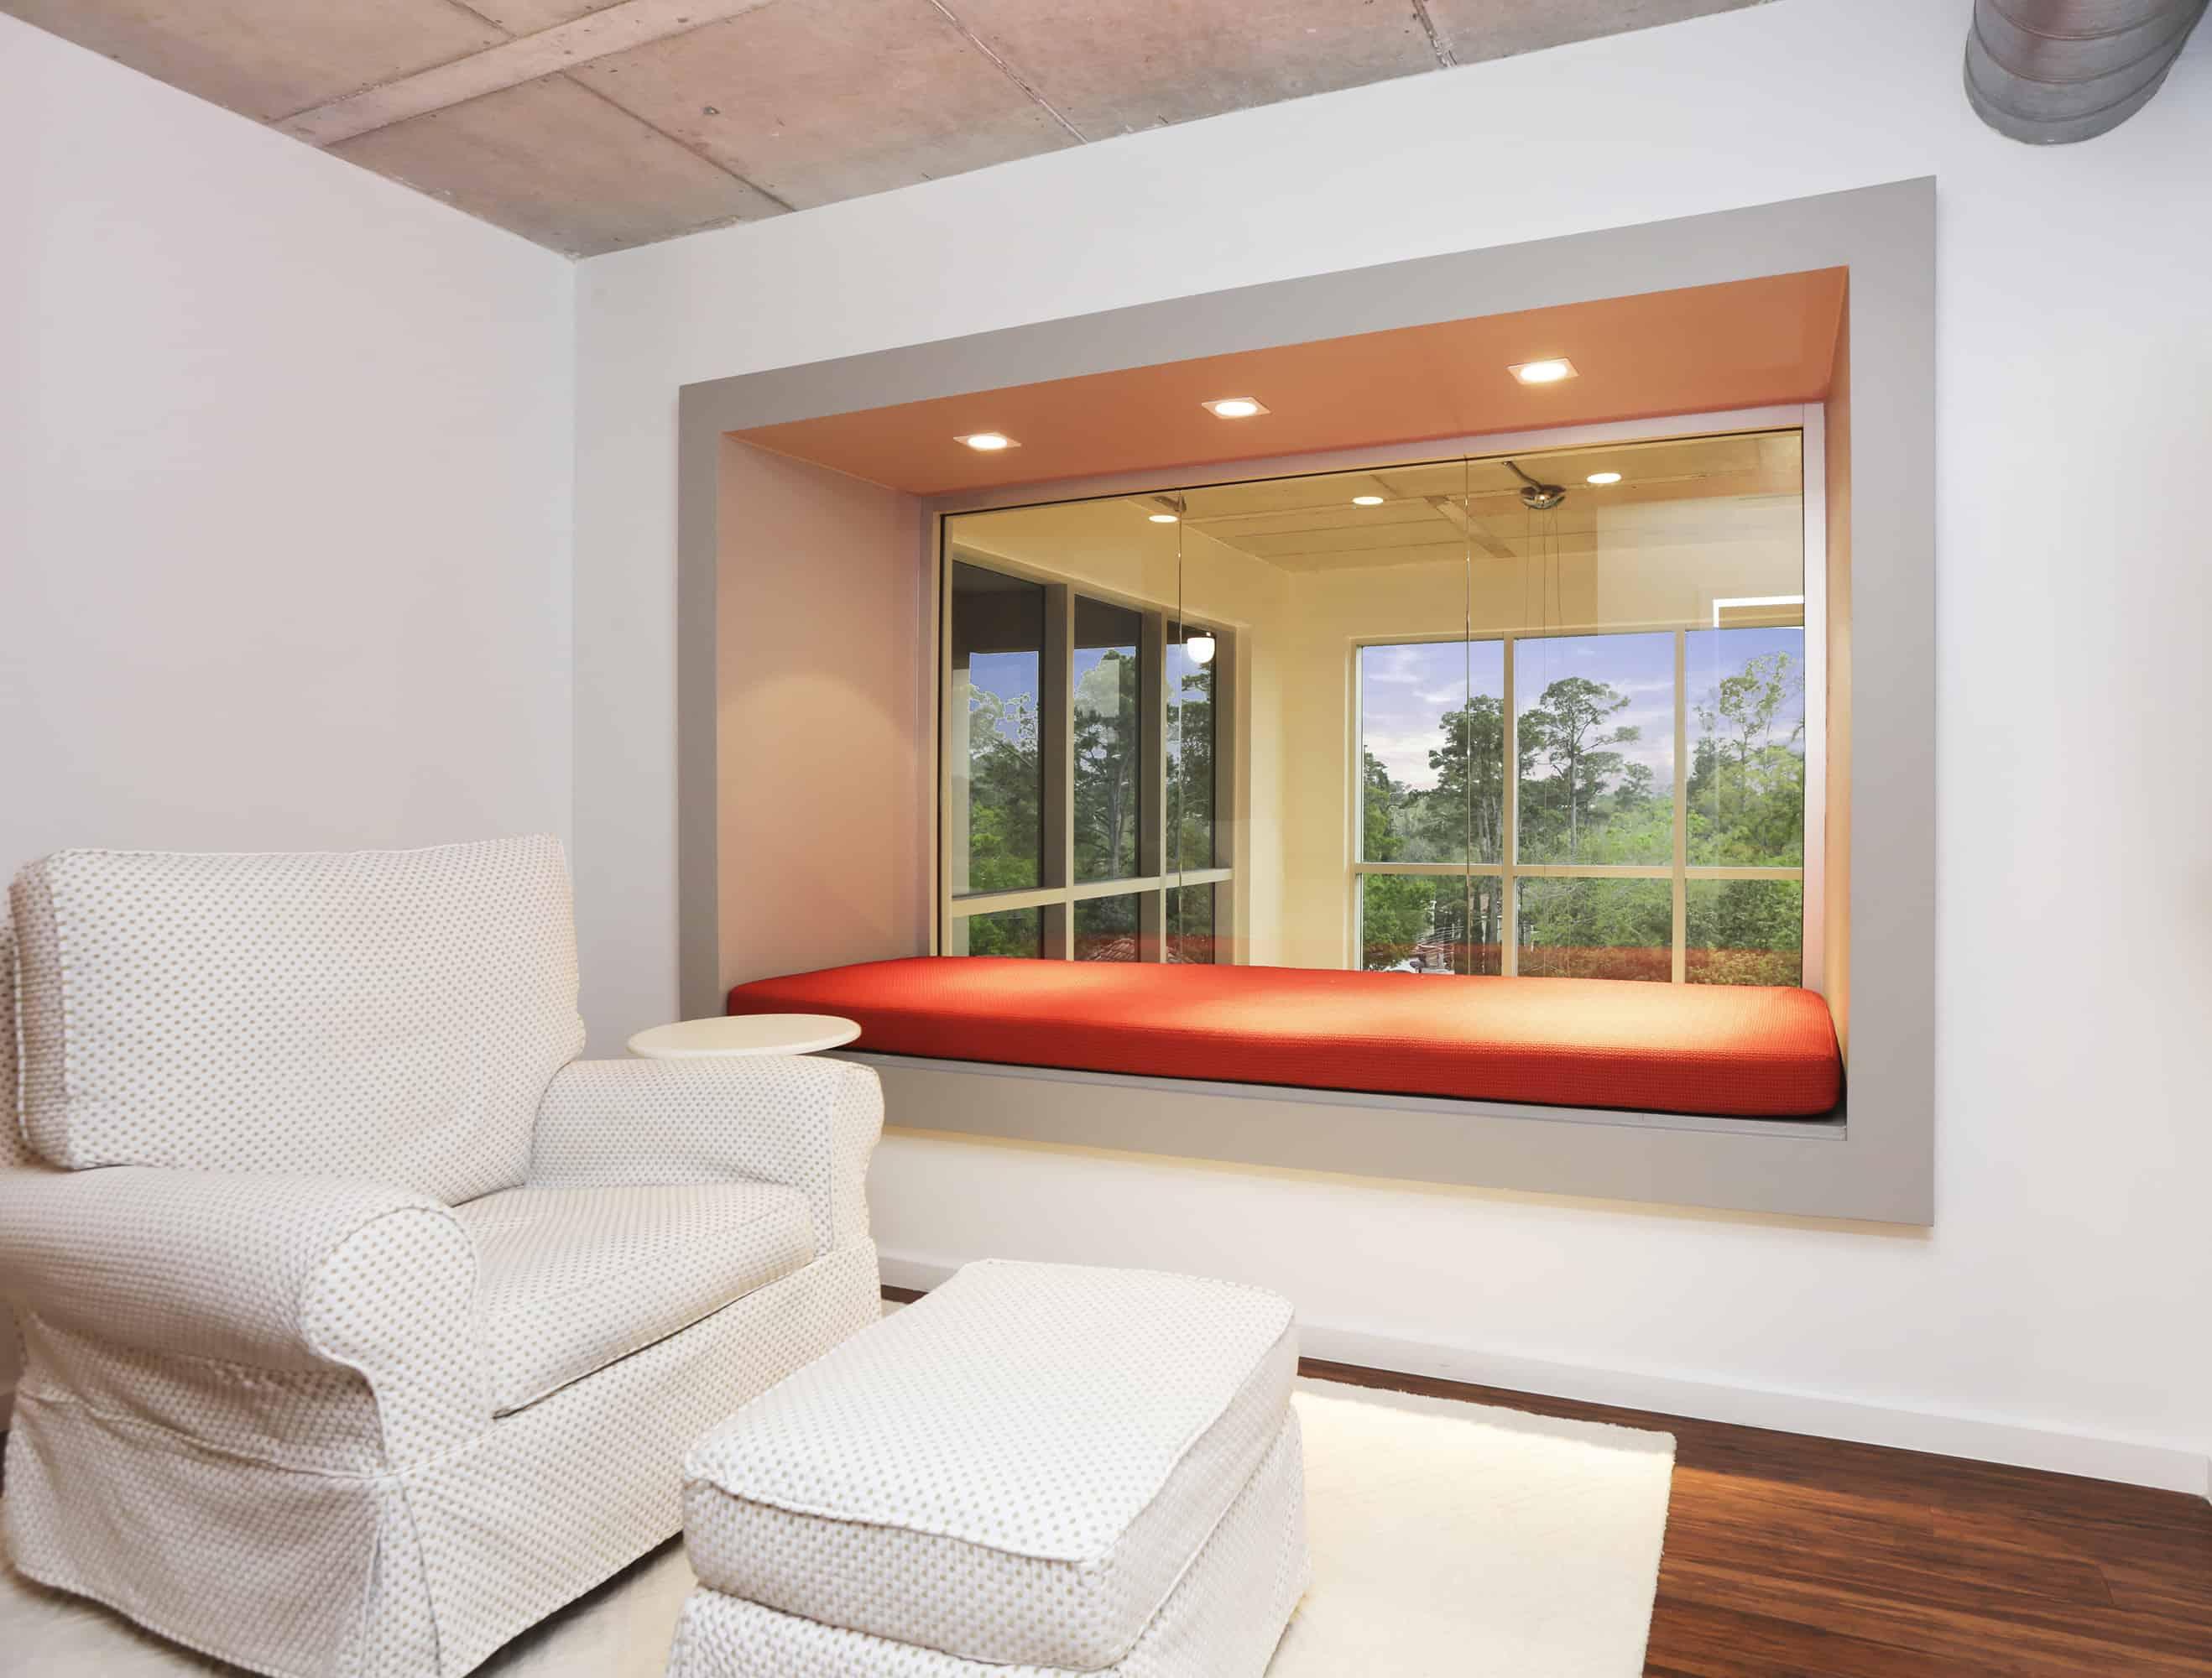 Memorial Luxury Loft window